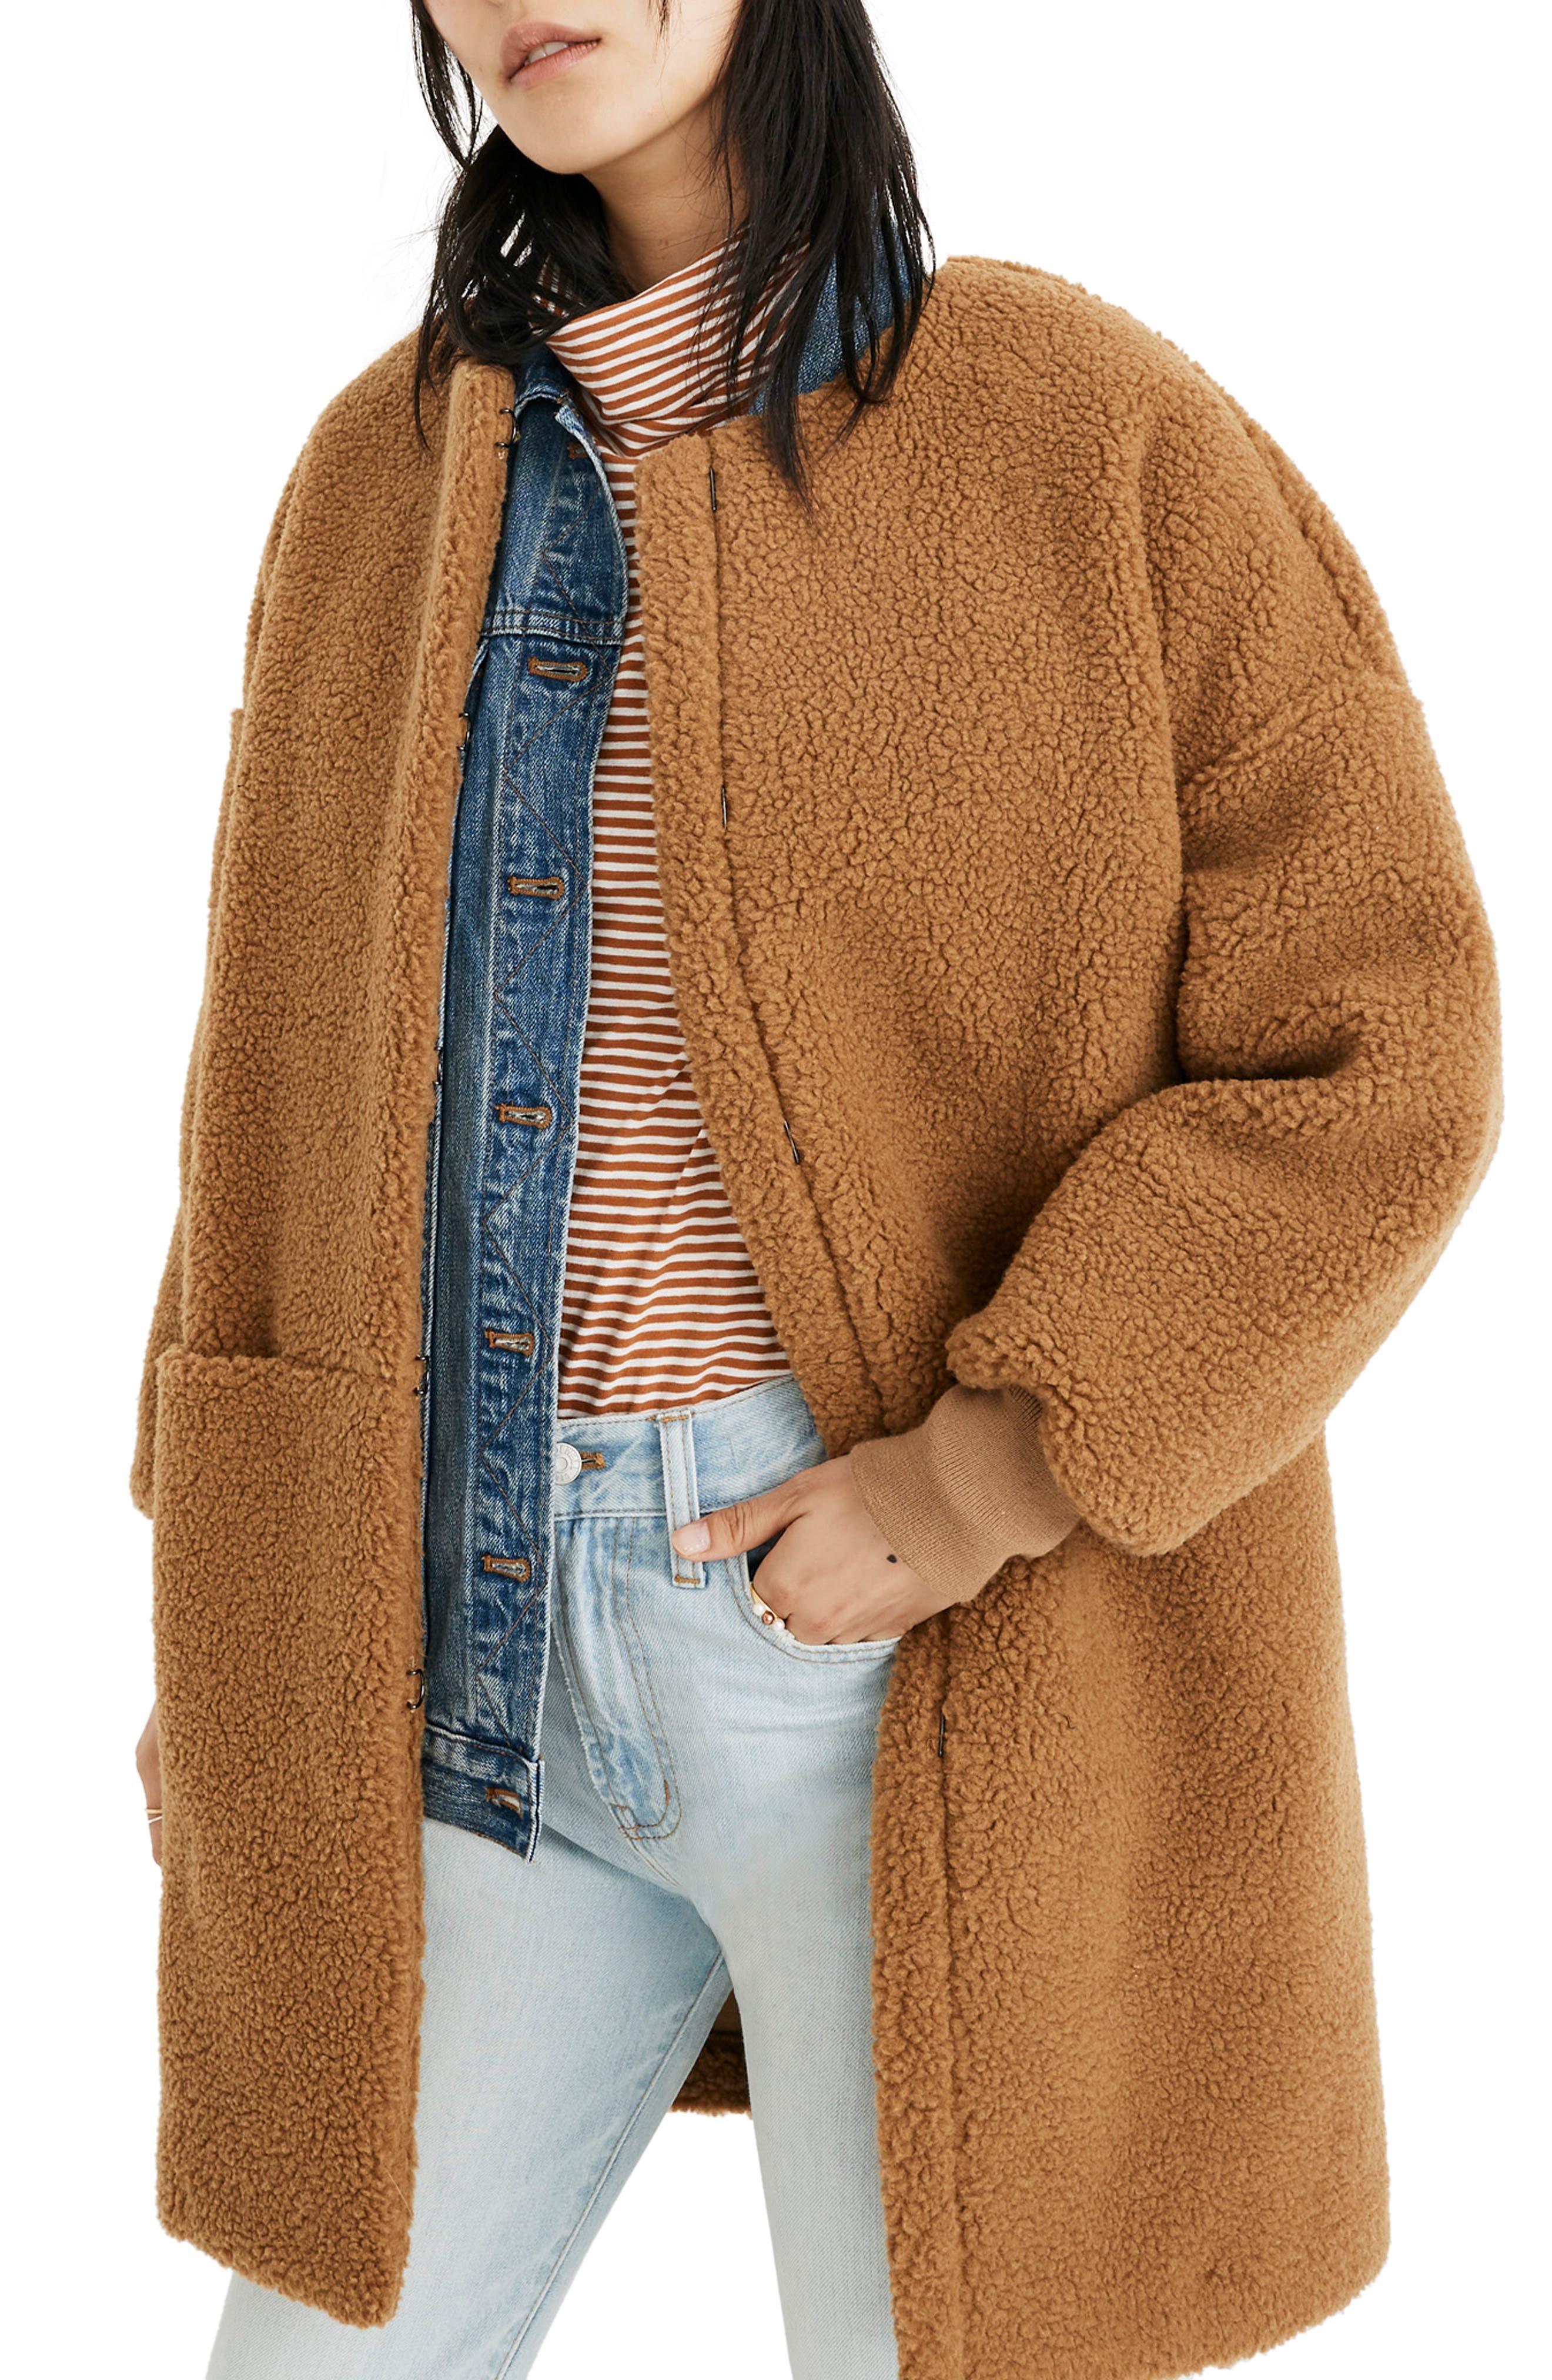 MADEWELL Bonded Fleece Cocoon Coat, Main, color, 200